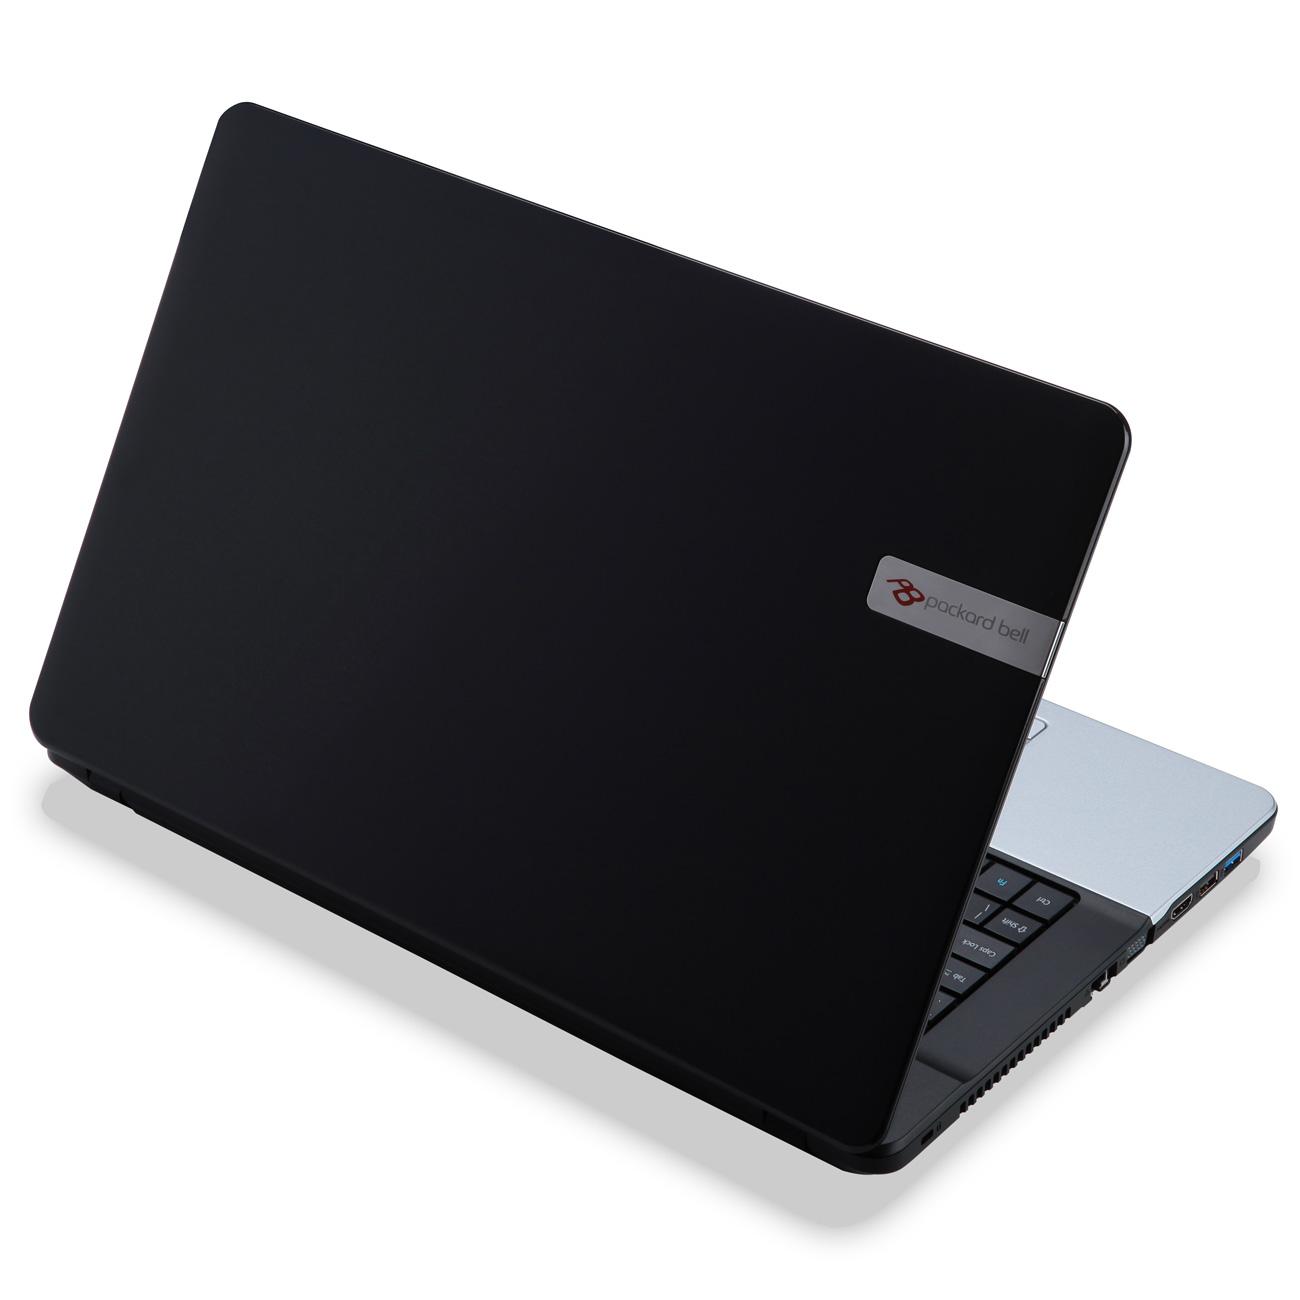 packard bell easynote le11bz e304g50mnks pc portable. Black Bedroom Furniture Sets. Home Design Ideas